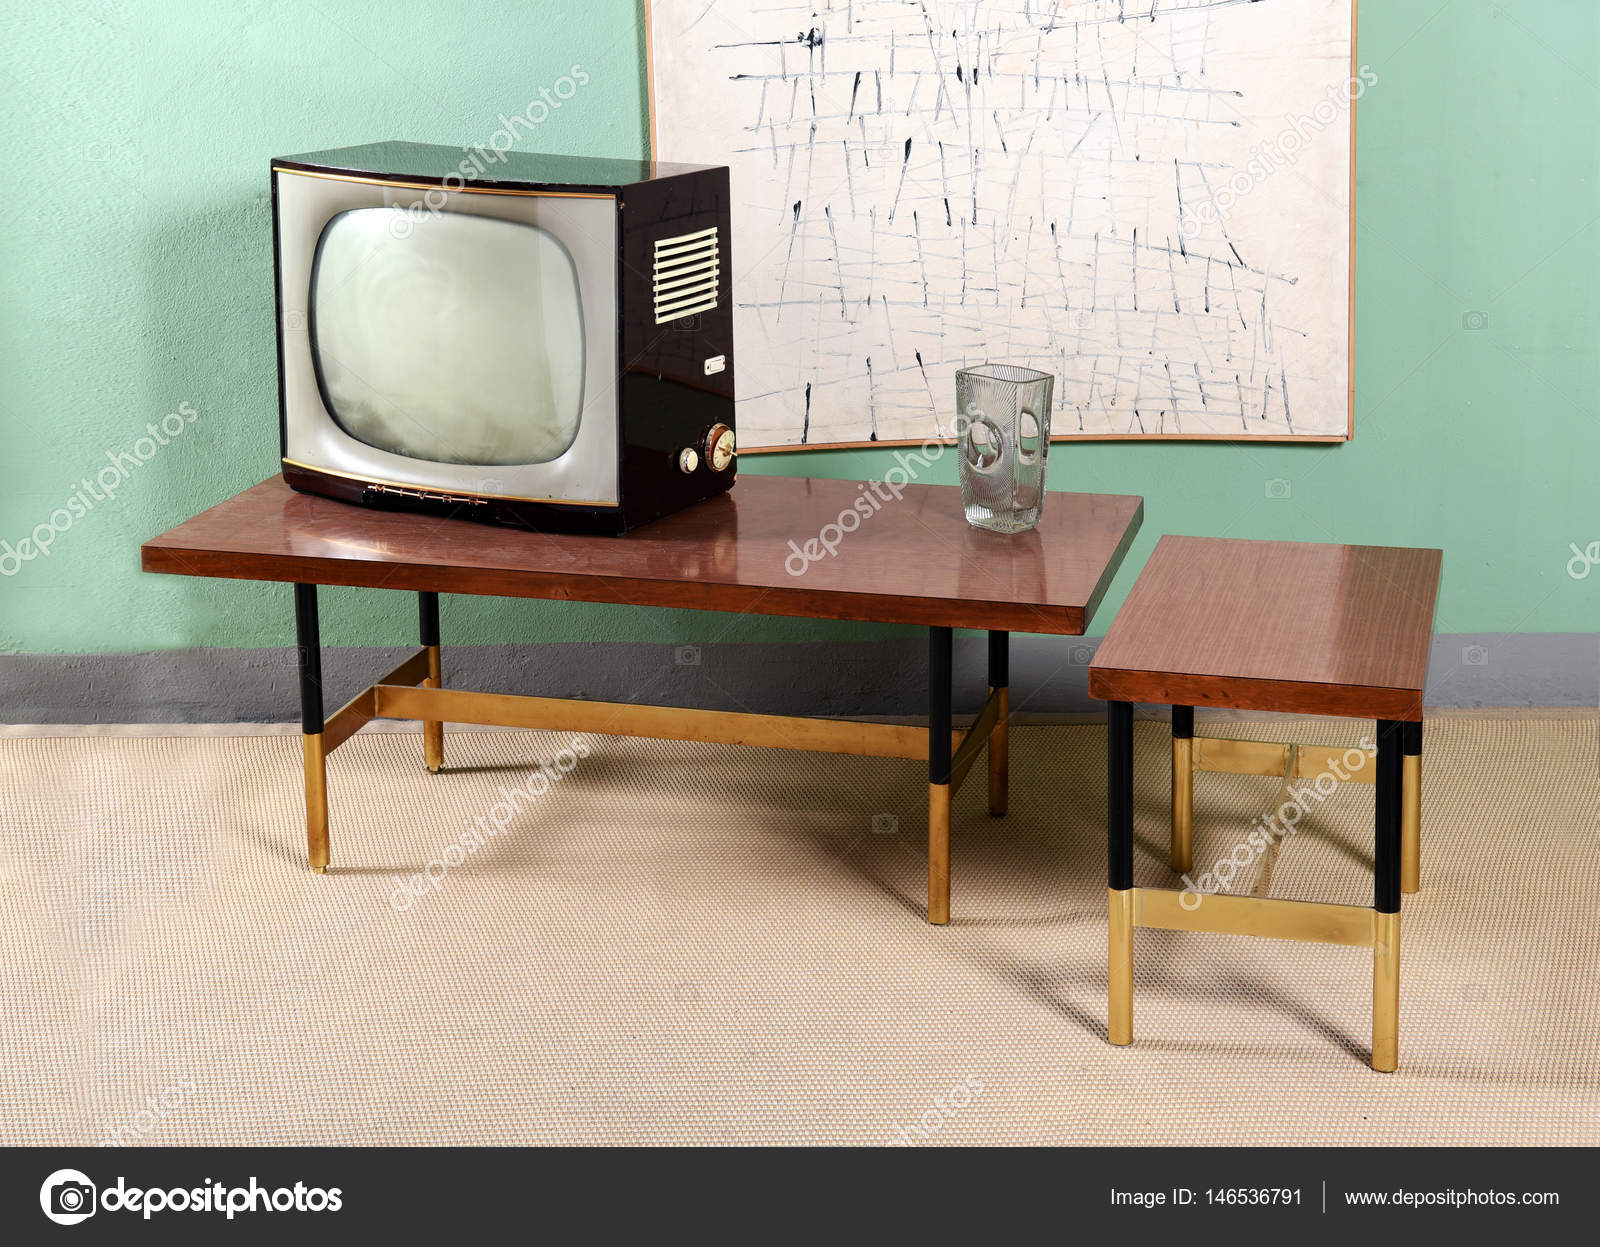 Retr Sala De Estar Com Tv Tabelas E Ilustra Es Stock Photo  -> Vasos Na Sala De Tv